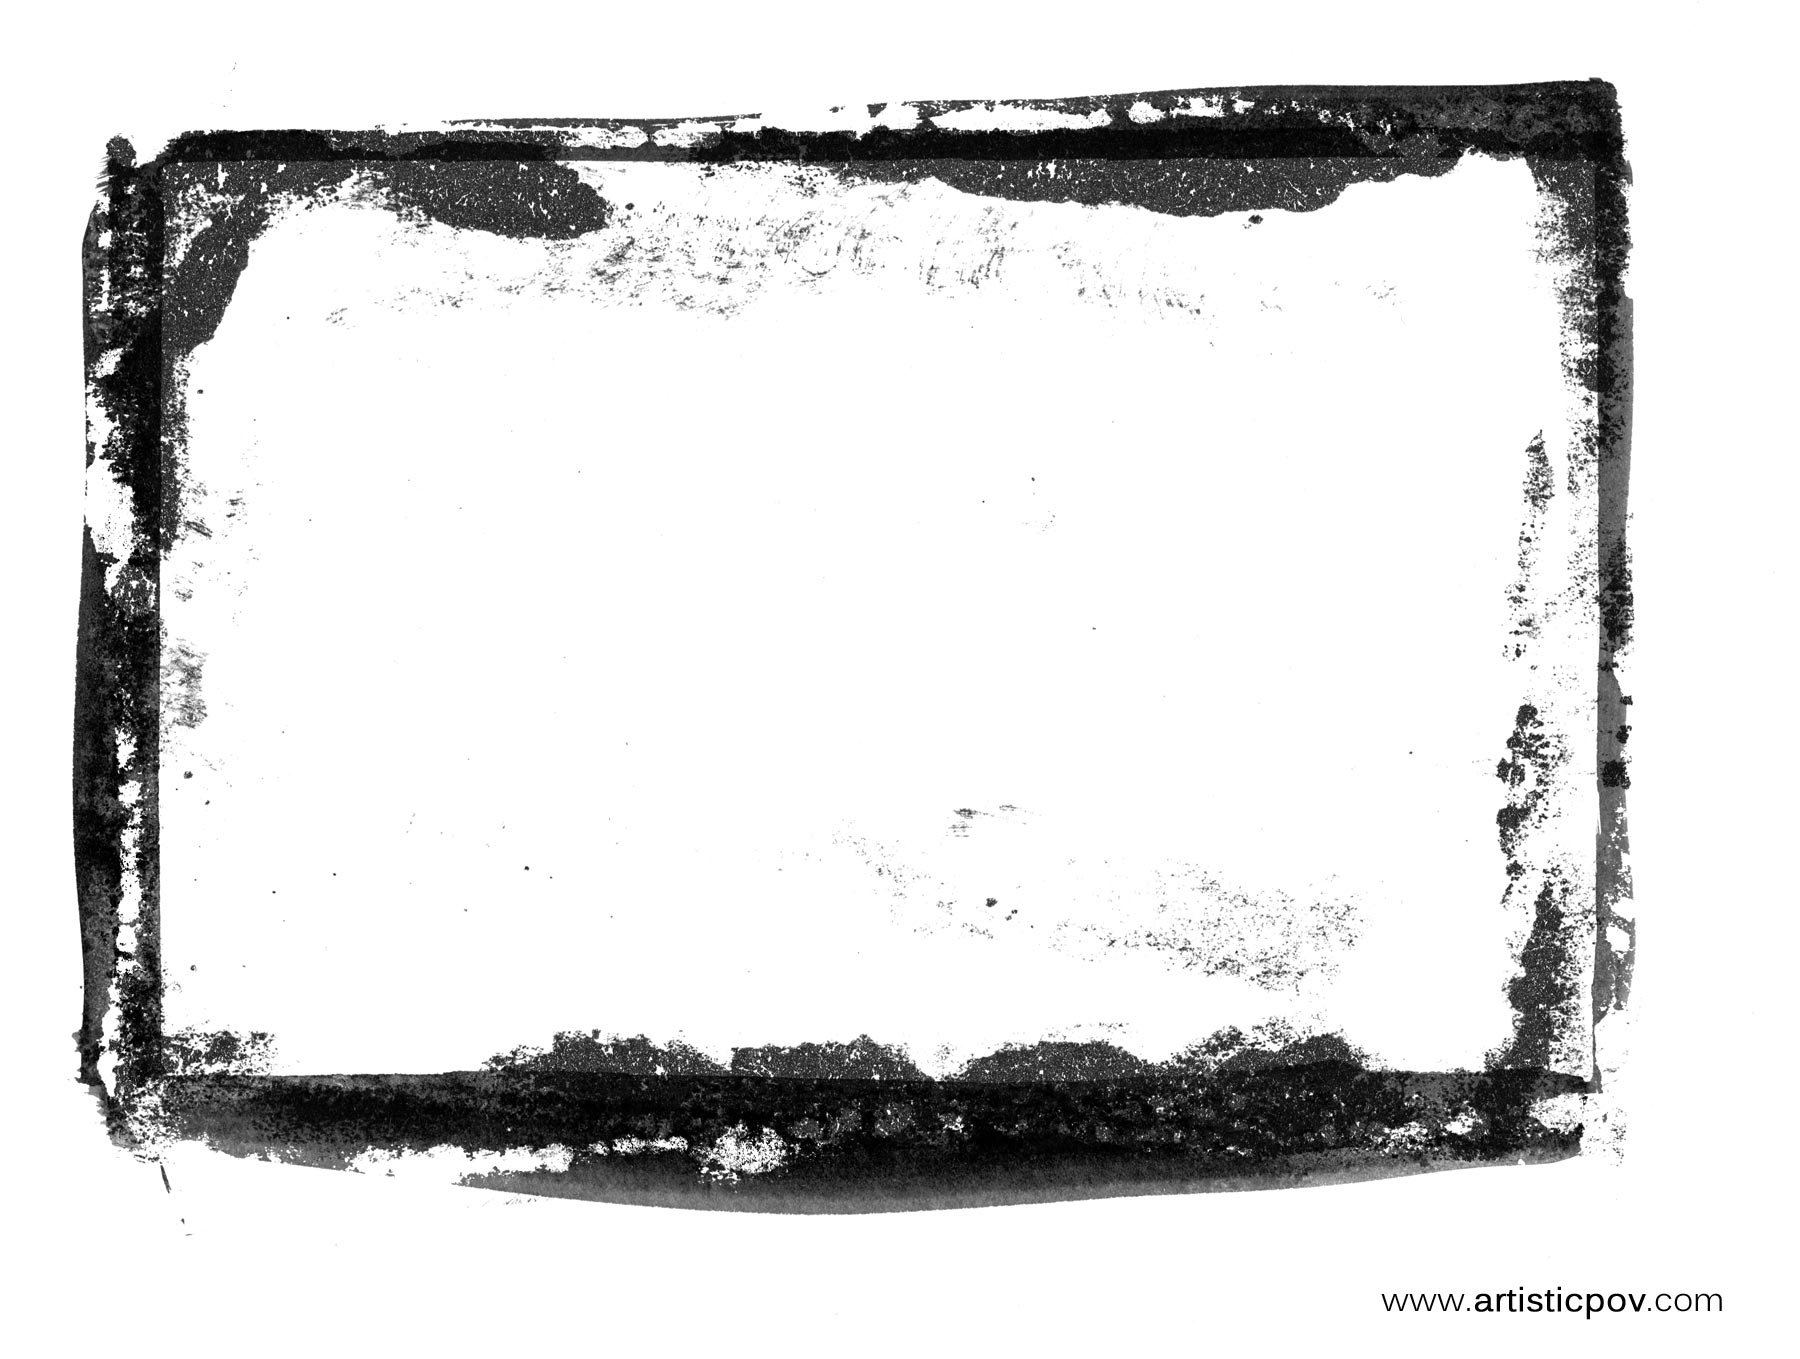 Grunge border texture photo